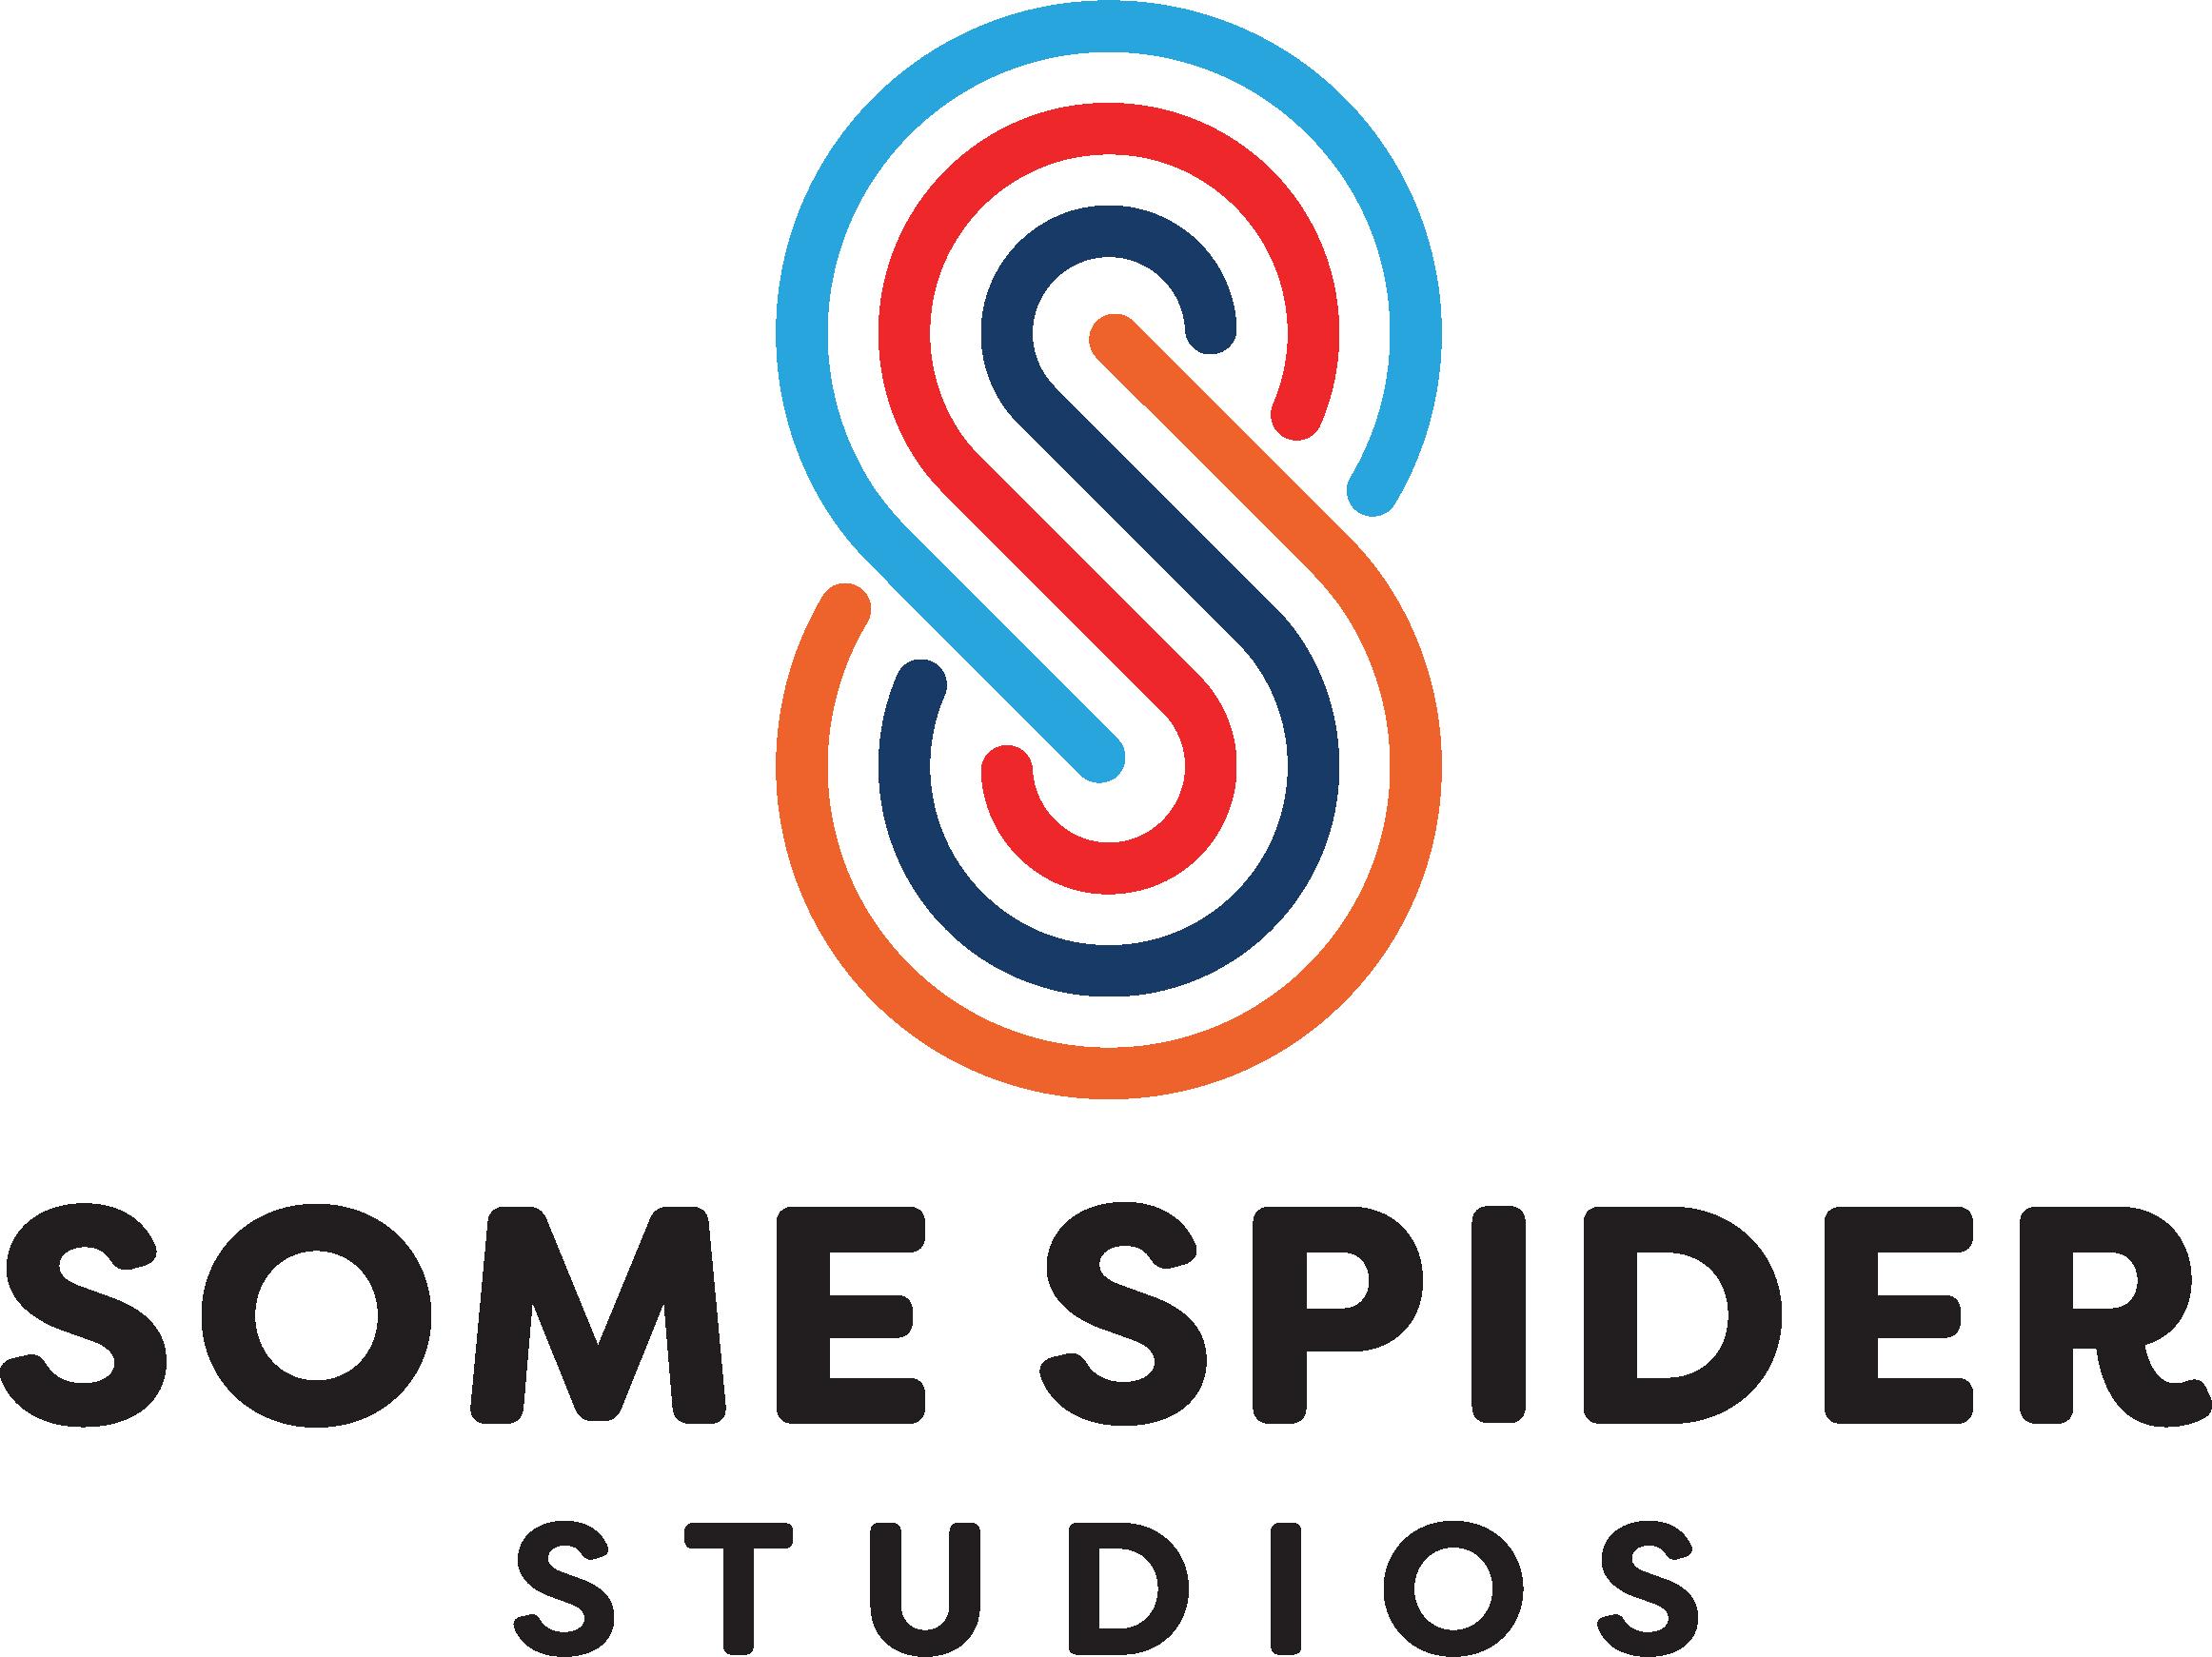 Some Spider Studios Logo